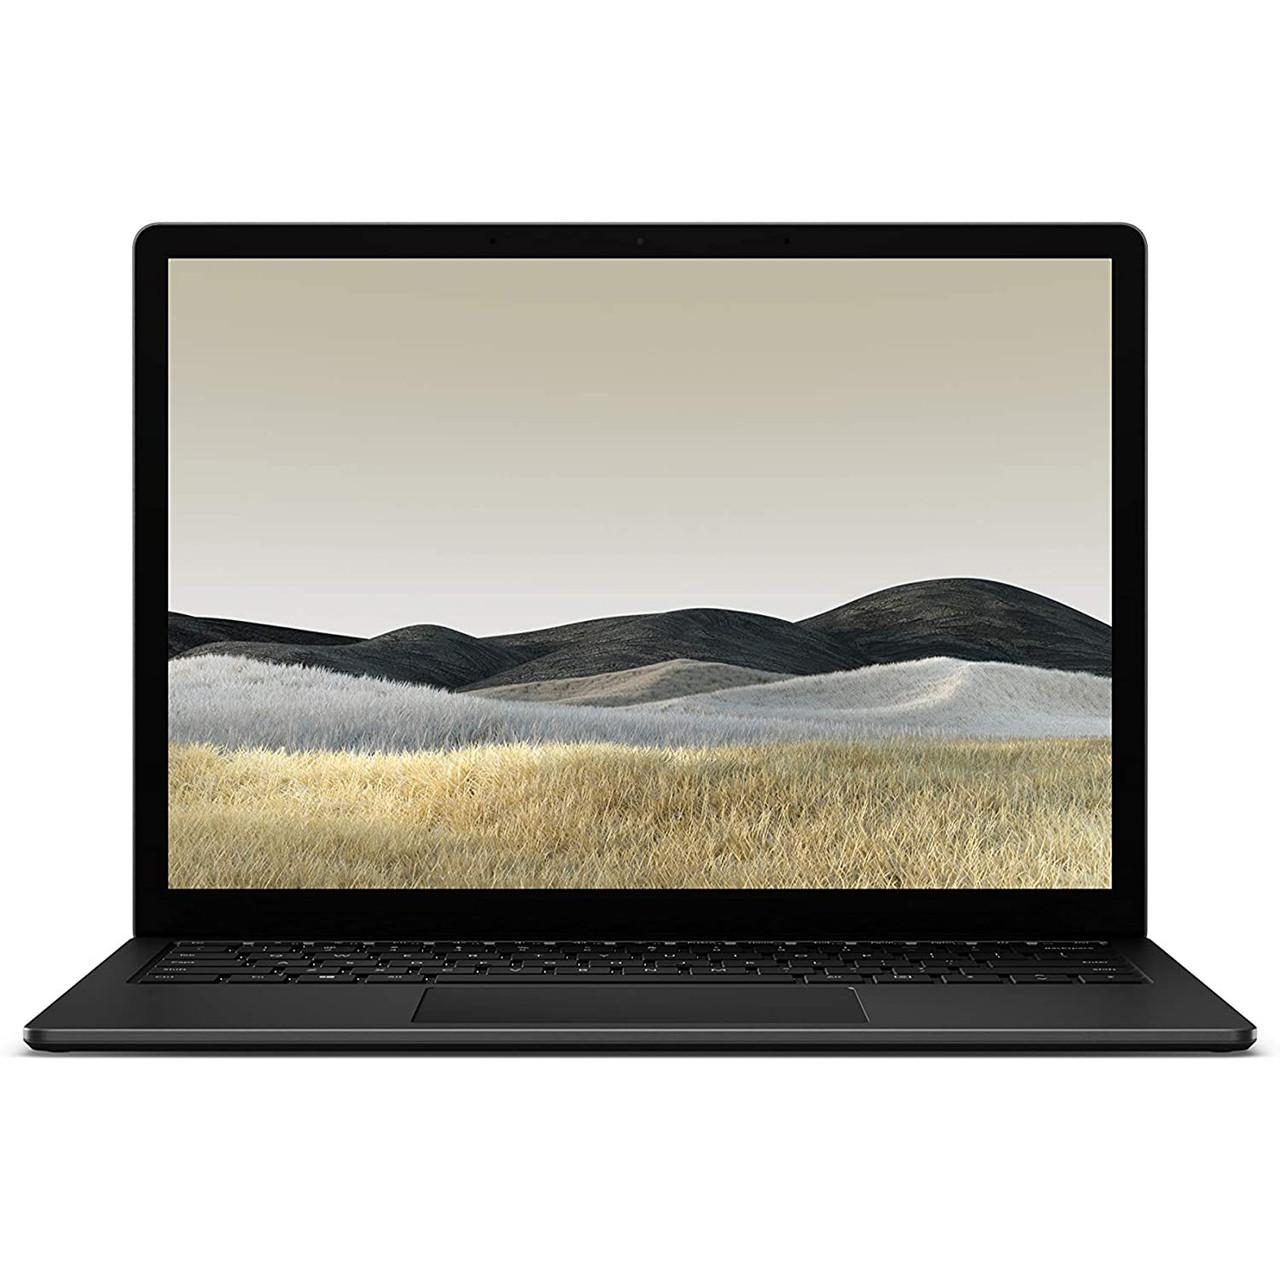 Microsoft Surface Laptop 3 (RYK-00003)